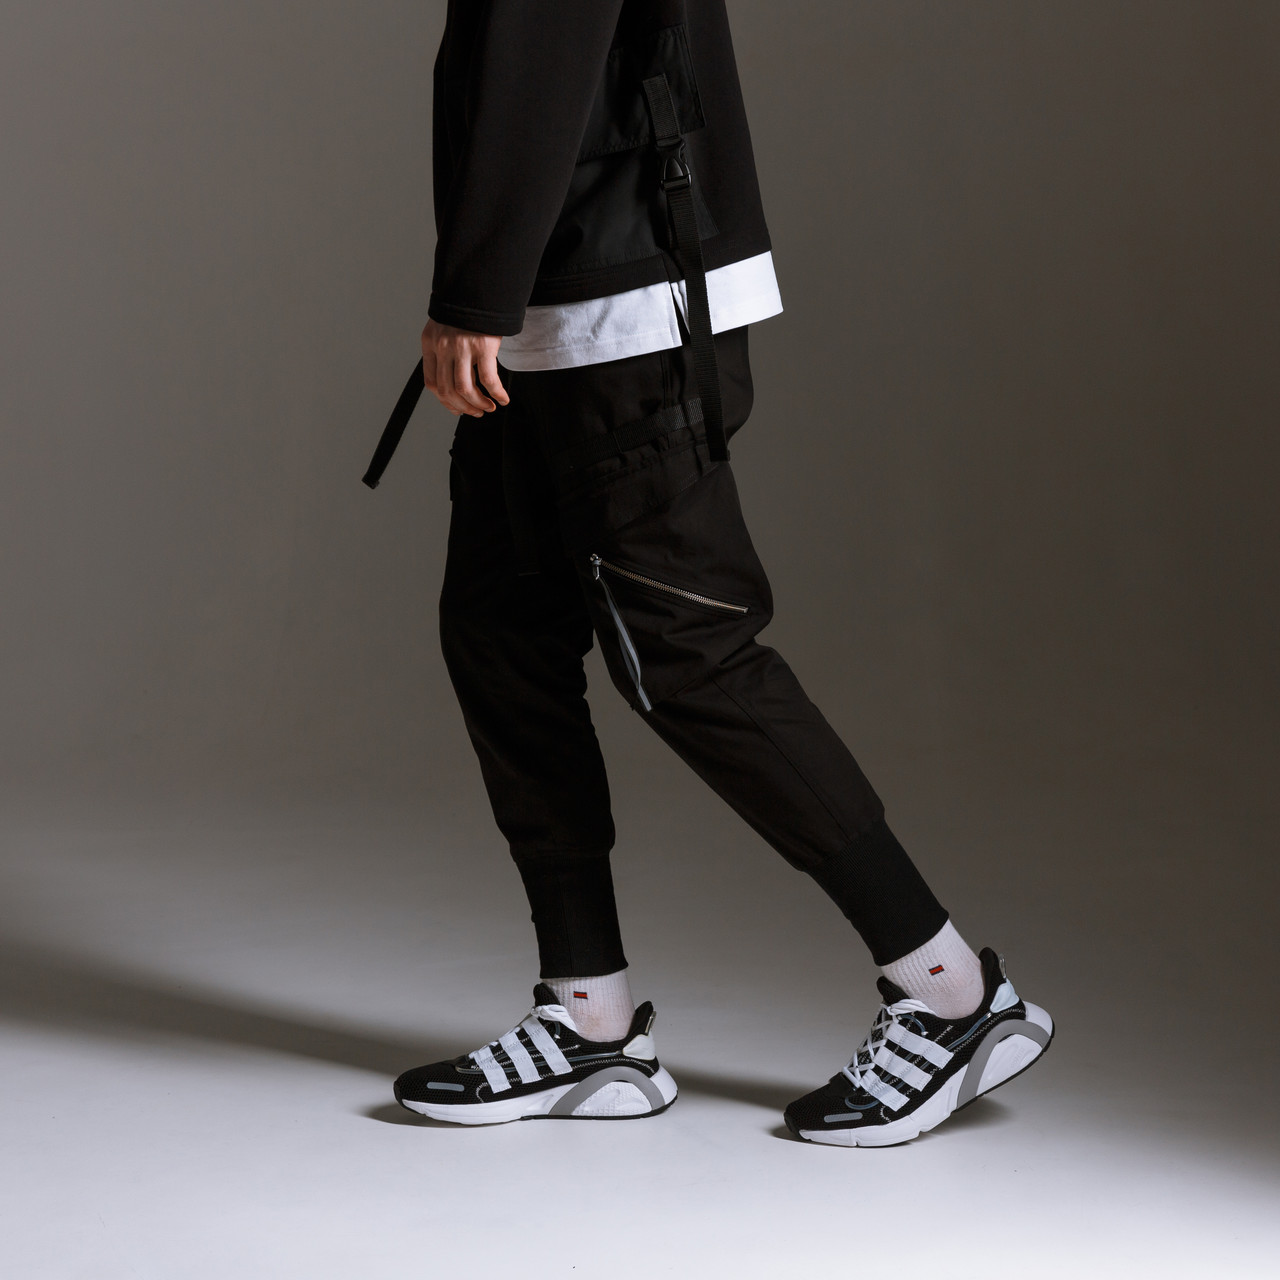 Штаны карго мужские черные бренд ТУР модель Барака (Baraka) TУRWEAR